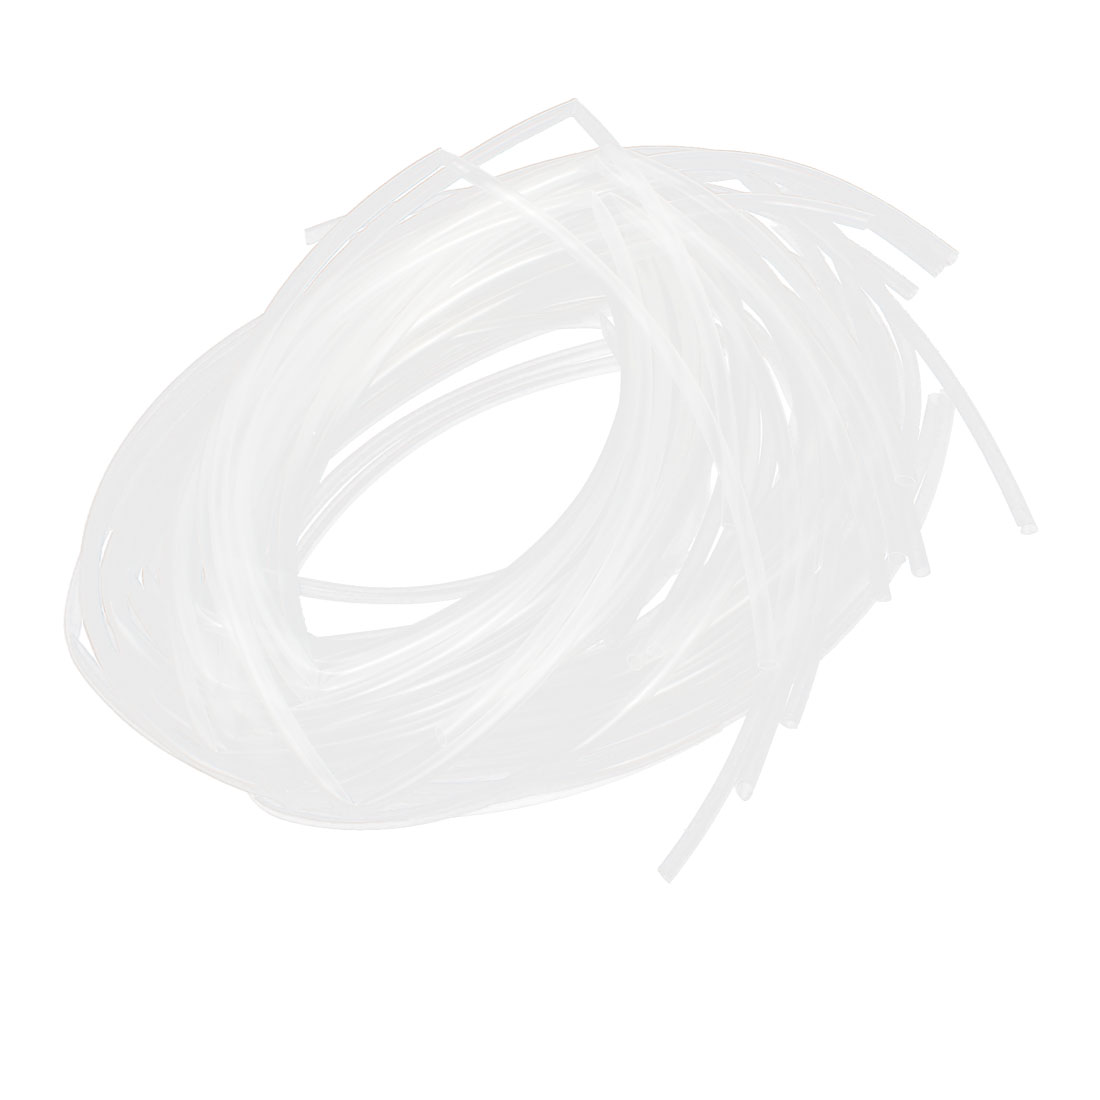 20Pcs Clear 3.3Ft 5mm Diameter Heat Shrink Tubing Shrinkable Tubes